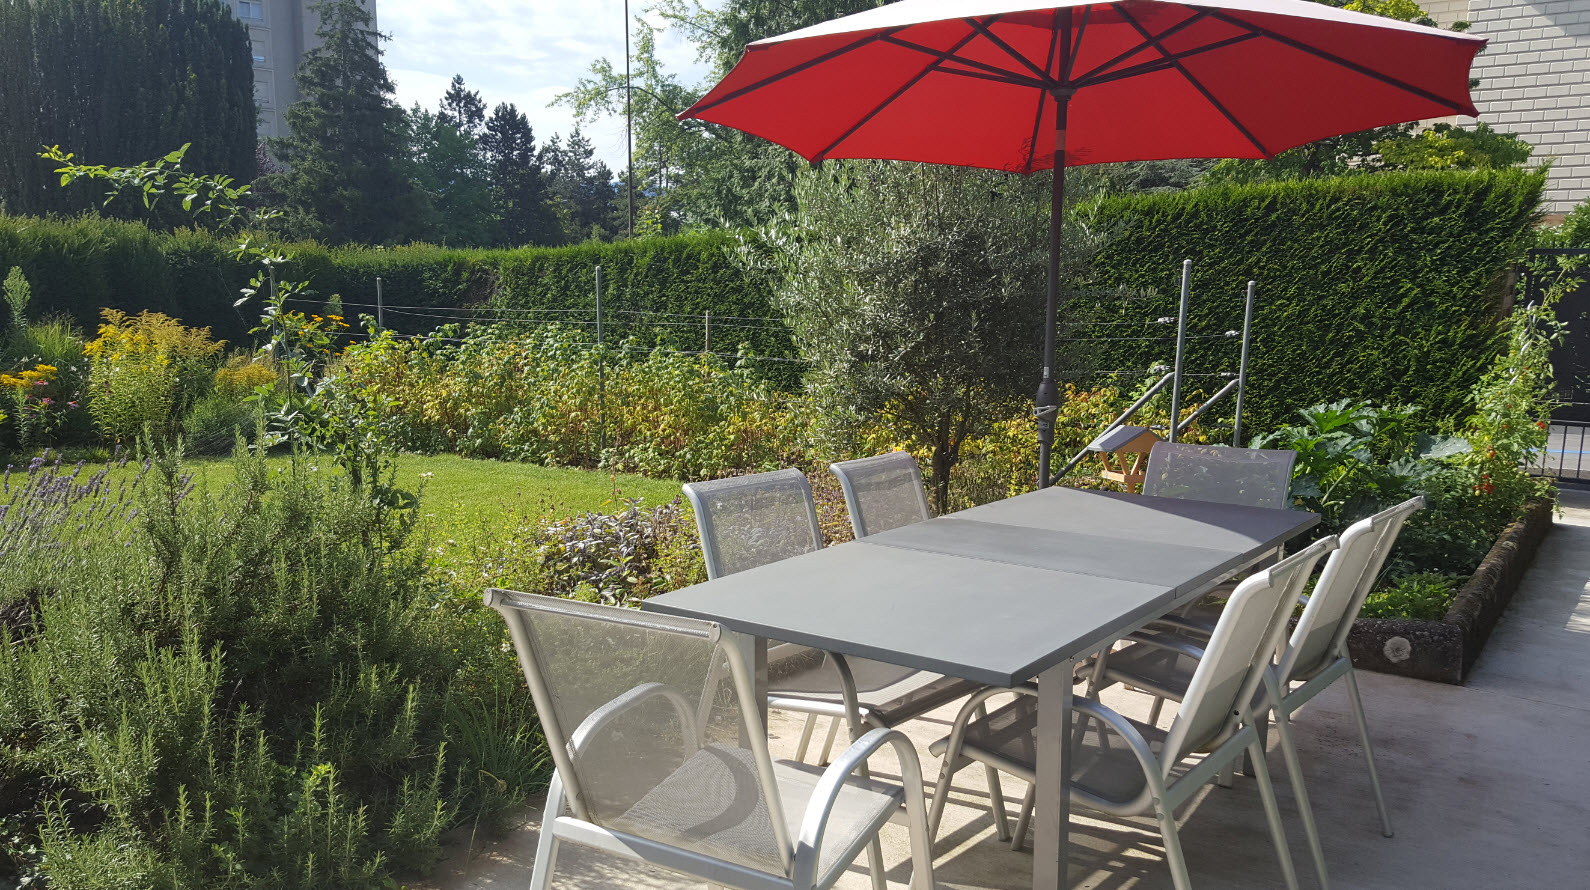 Grande table dans le jardin